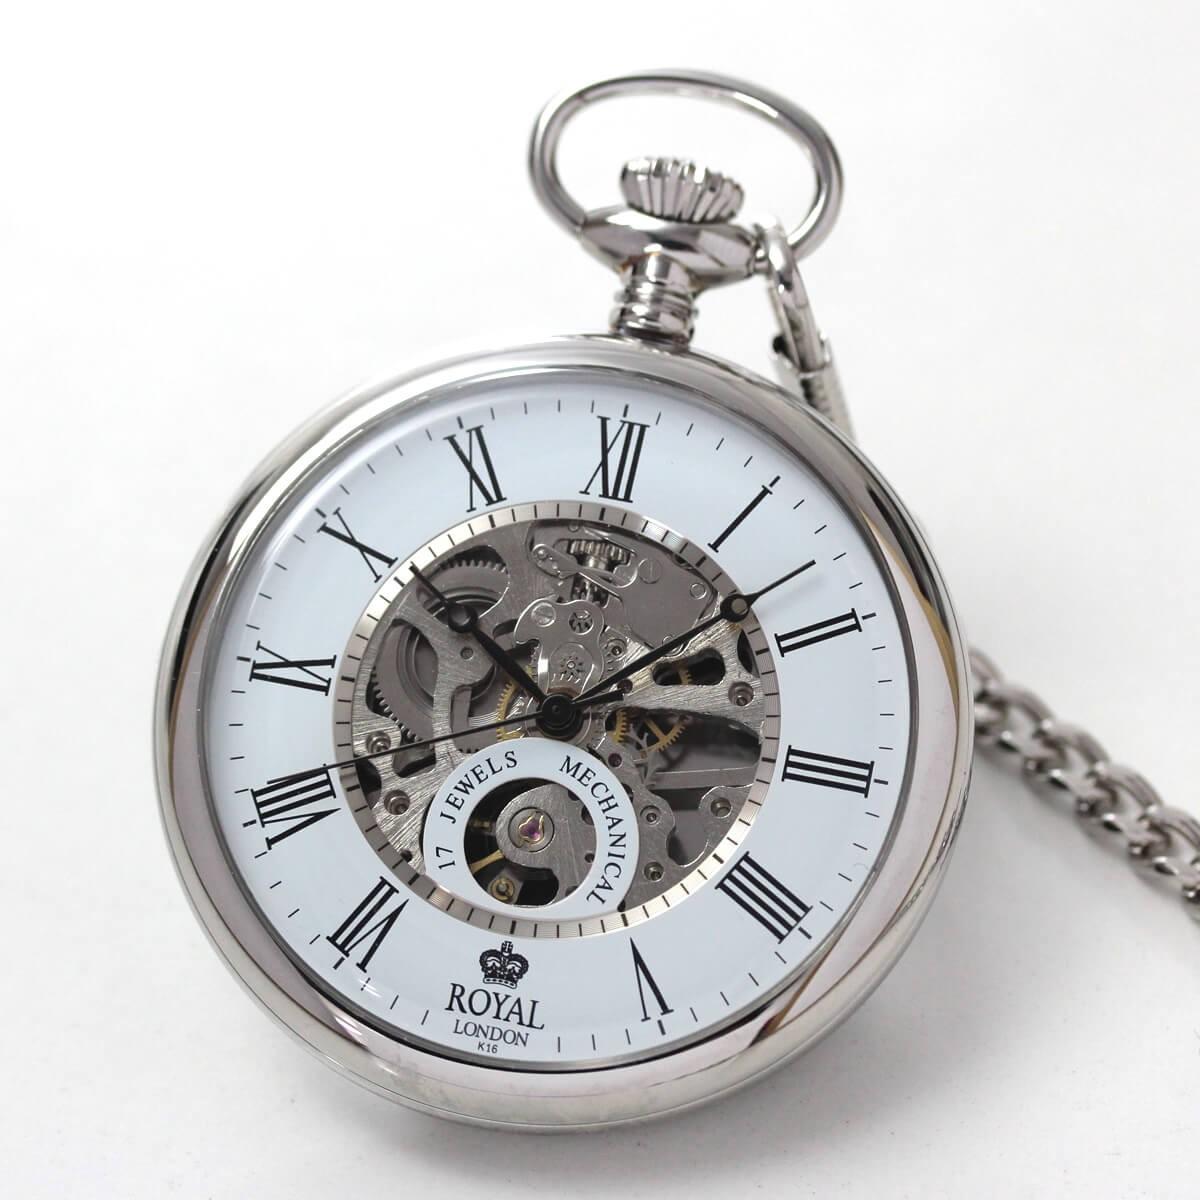 ROYAL LONDON(ロイヤルロンドン) 手巻きスケルトン懐中時計 90049-01